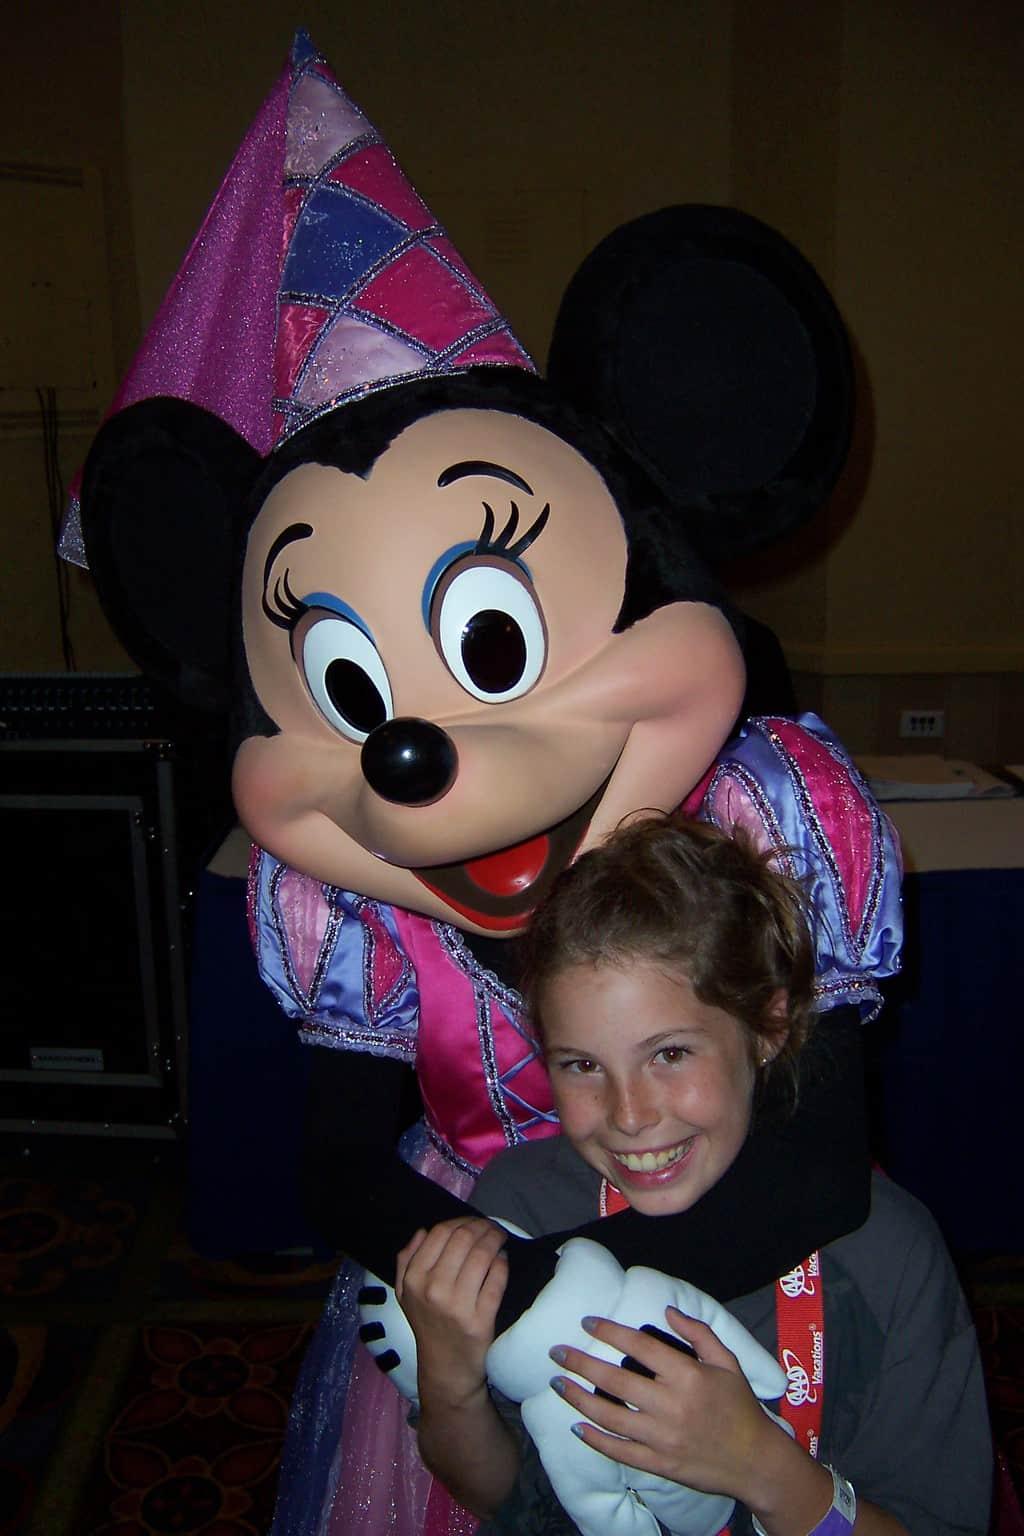 Minnie Mouse Disneyland 2007